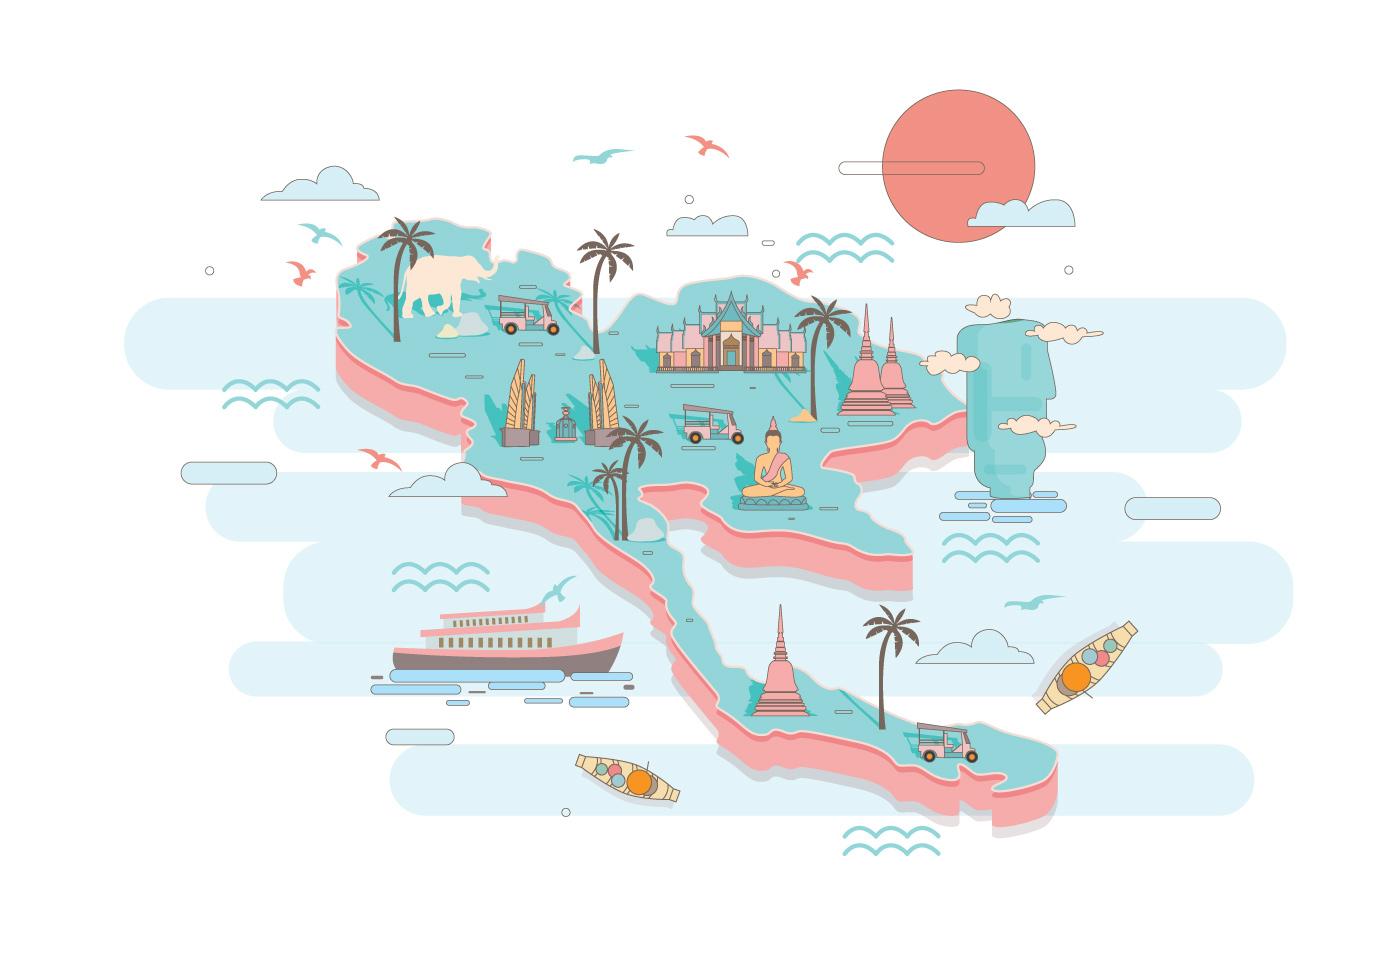 Thailand Map Free Vector Art - (42 Free Downloads)